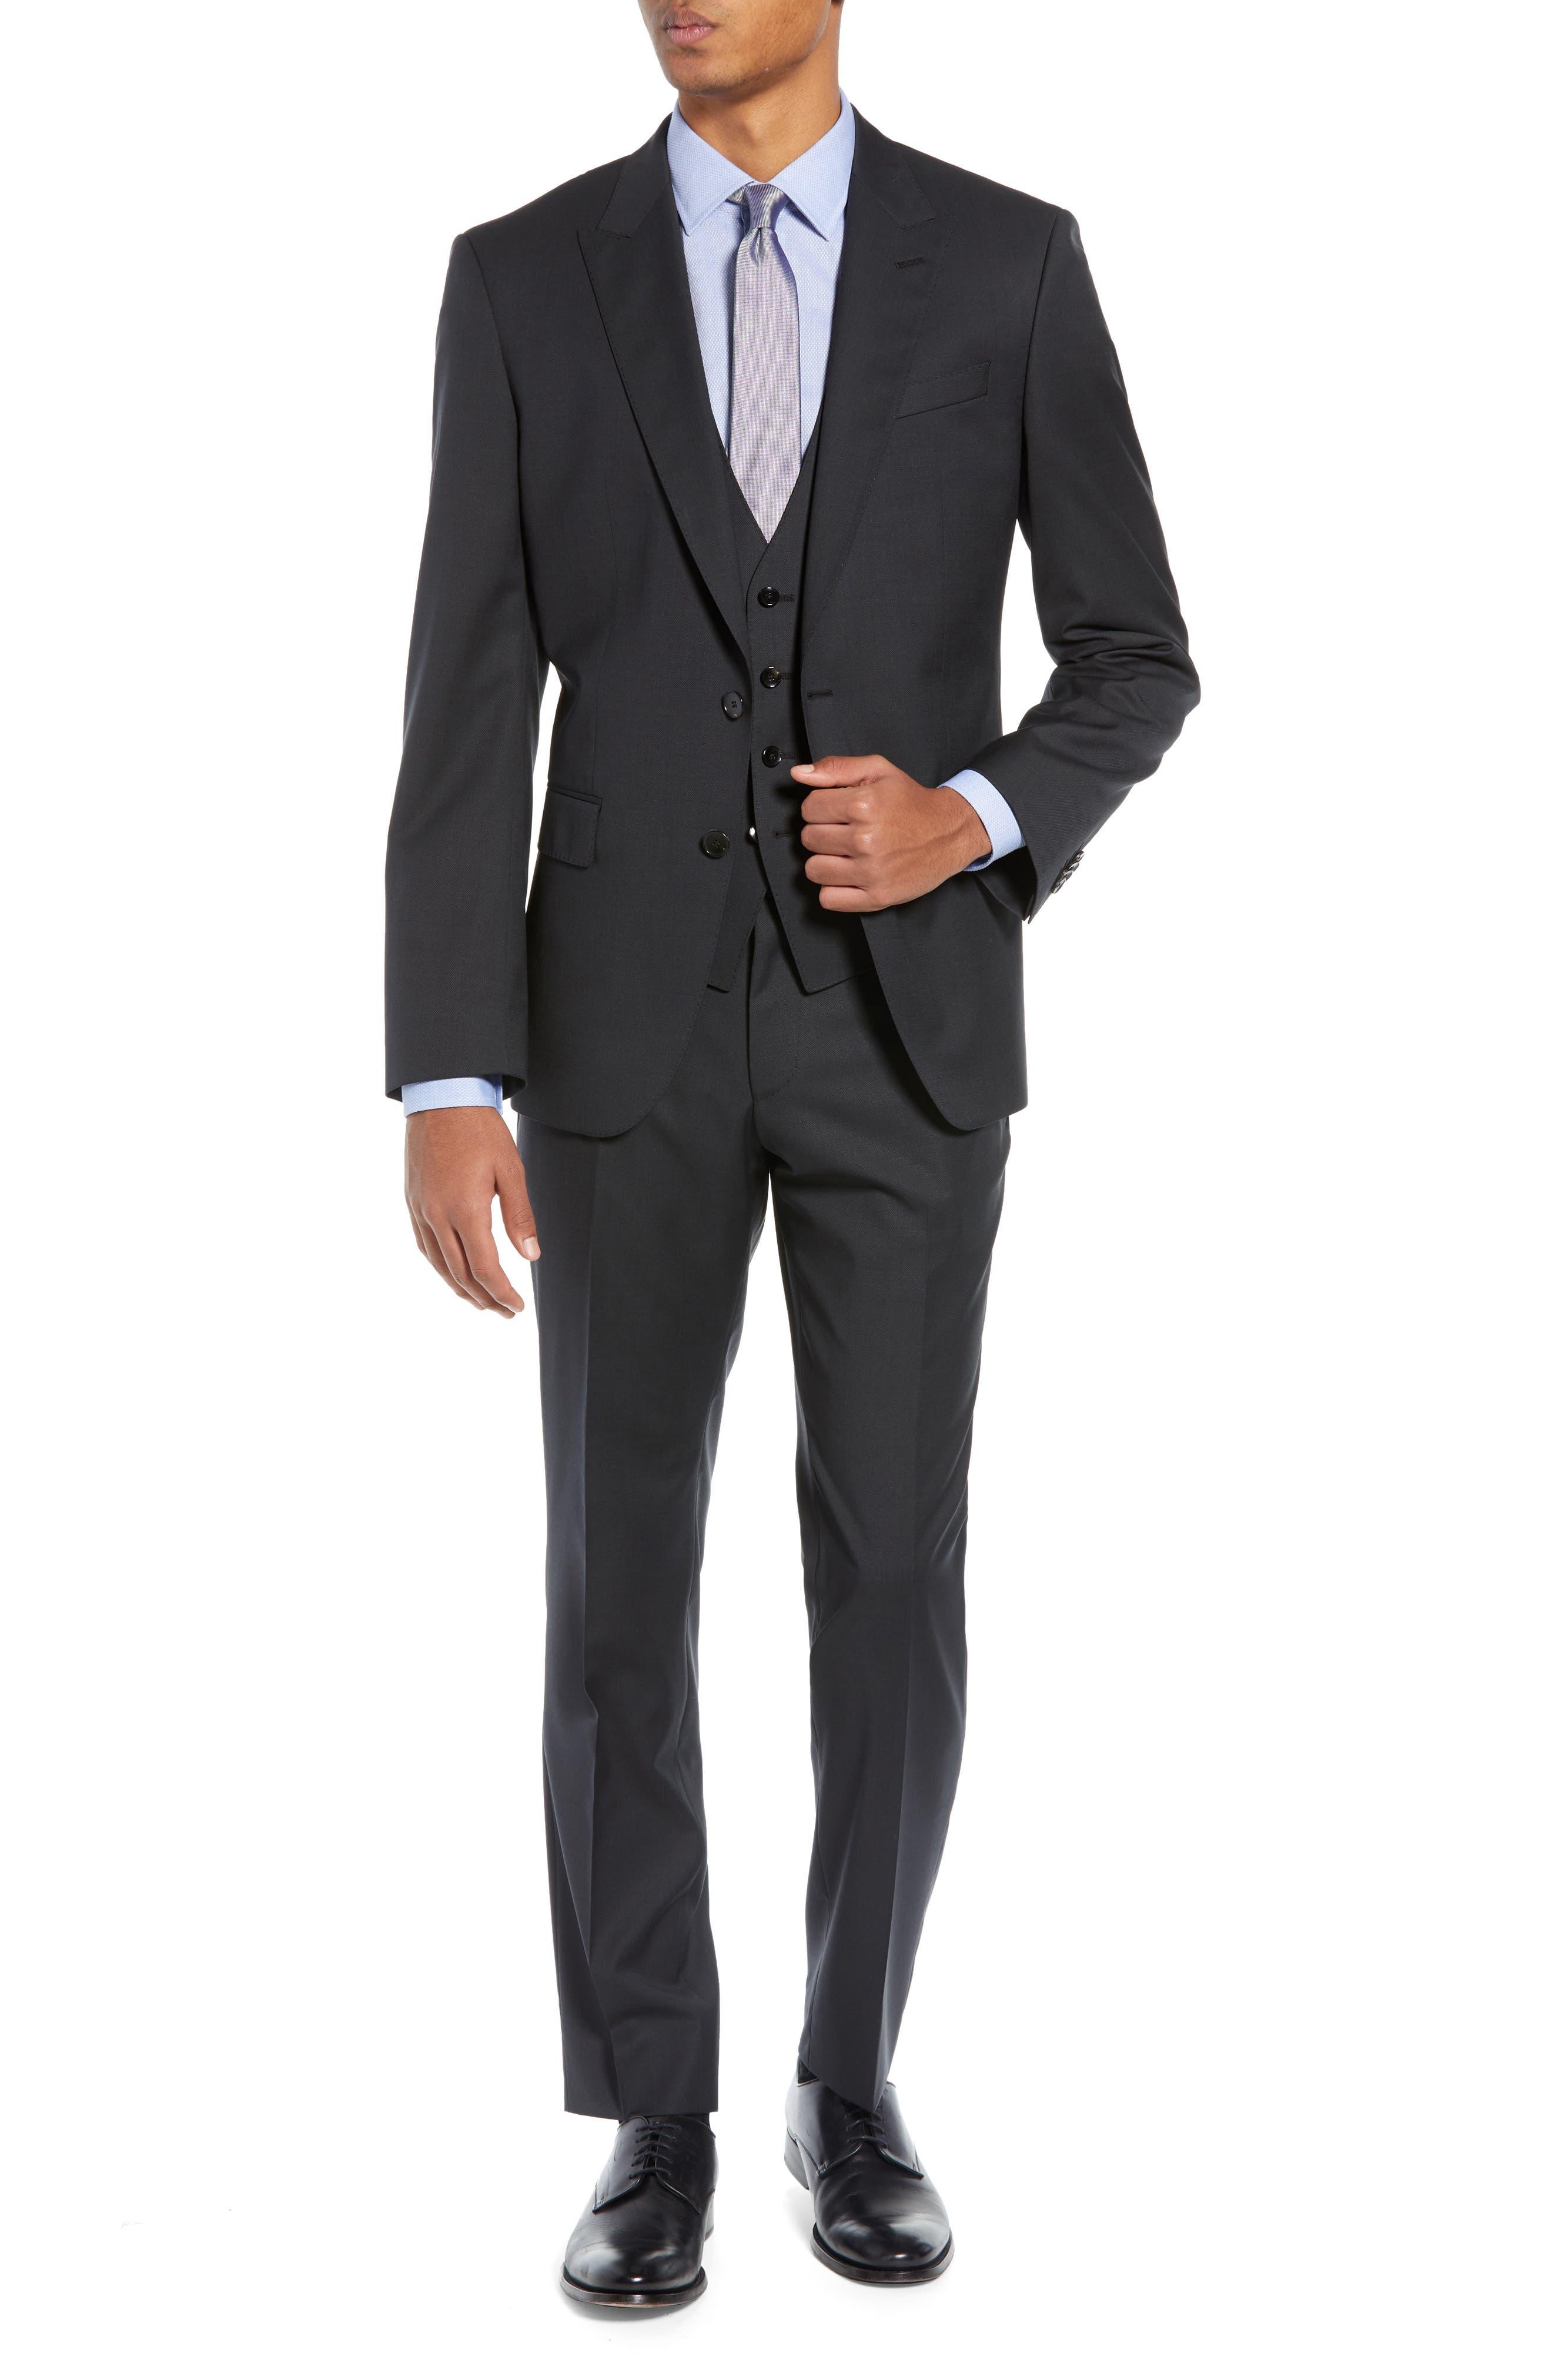 BOSS,                             Helward/Genius Trim Fit Solid Three Piece Wool Suit,                             Main thumbnail 1, color,                             DARK GREY